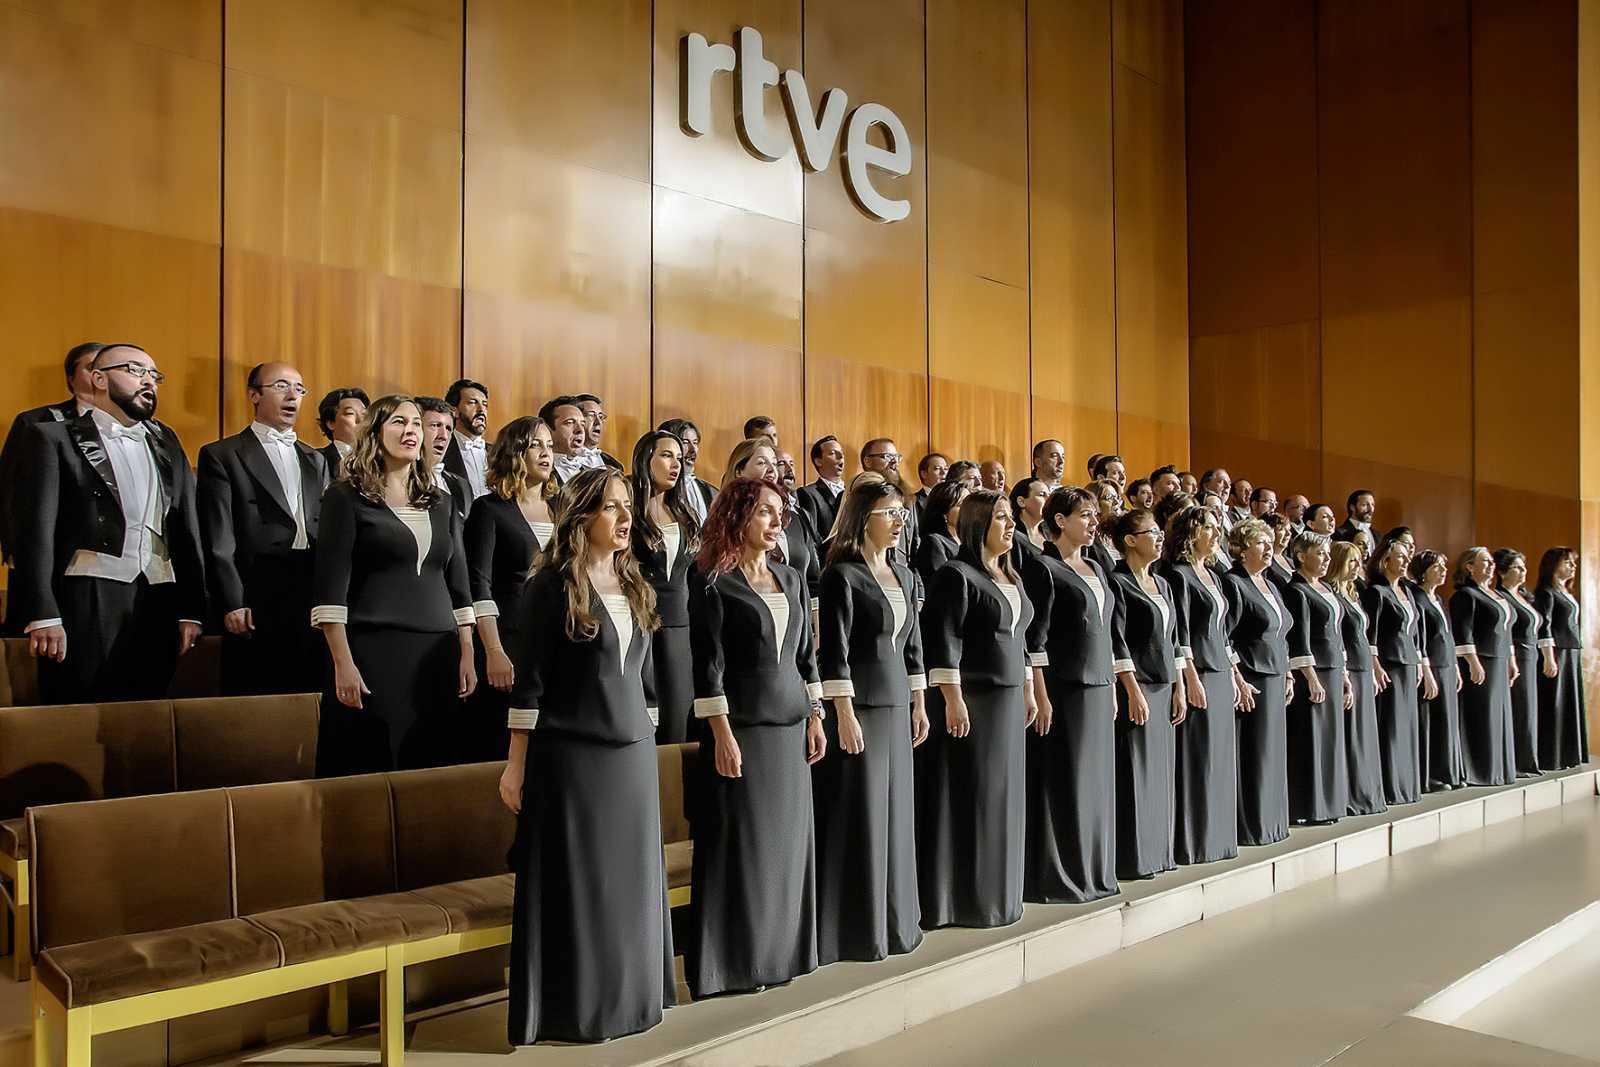 Crítica: Petrenko debuta como titular de la Filarmónica de Berlín